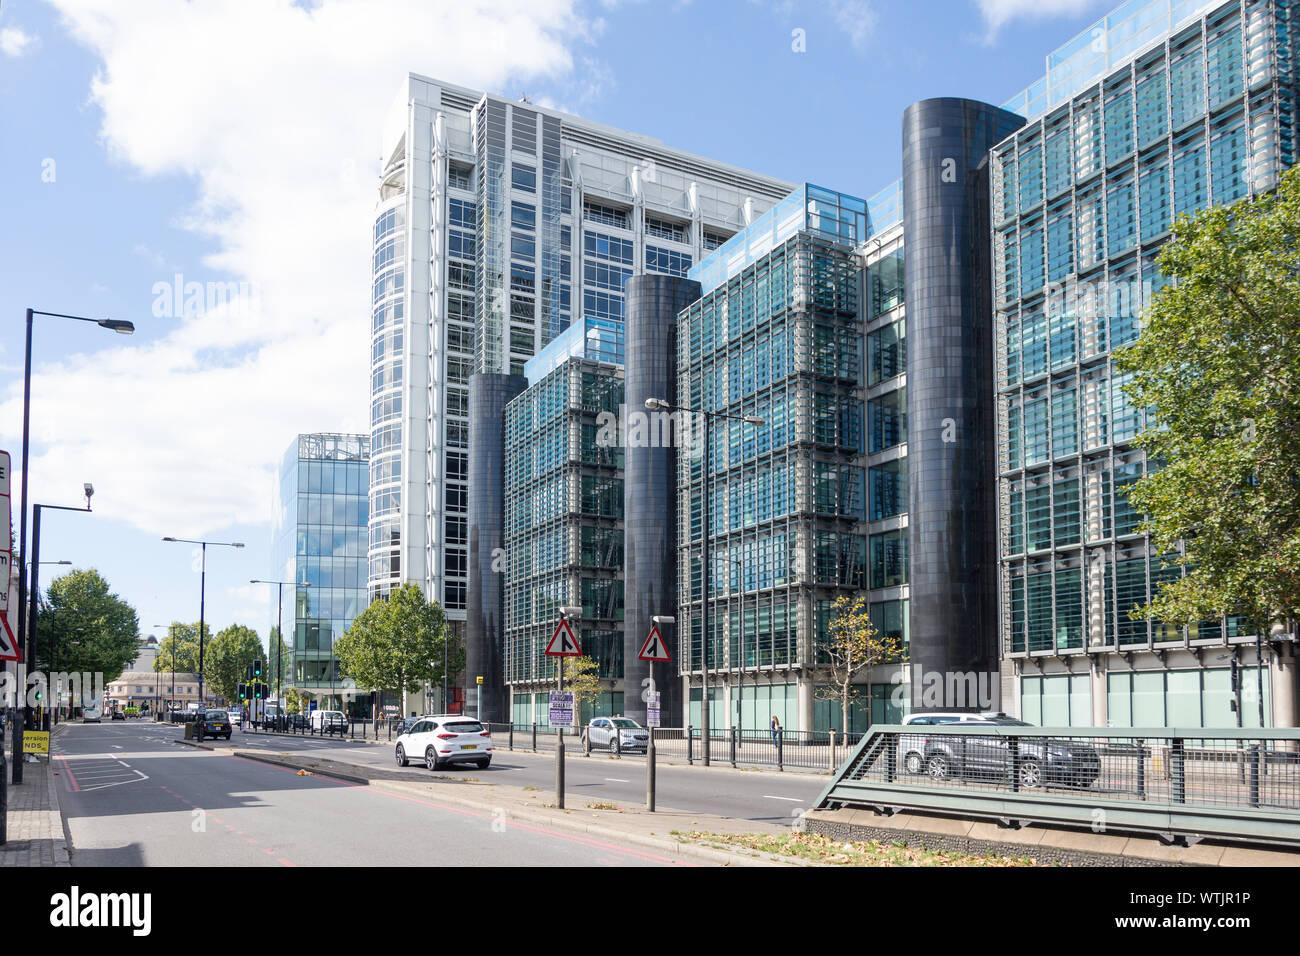 Regent's Place, Euston Road, Fitzrovia, London Borough of Camden, Greater London, England, United Kingdom Stock Photo